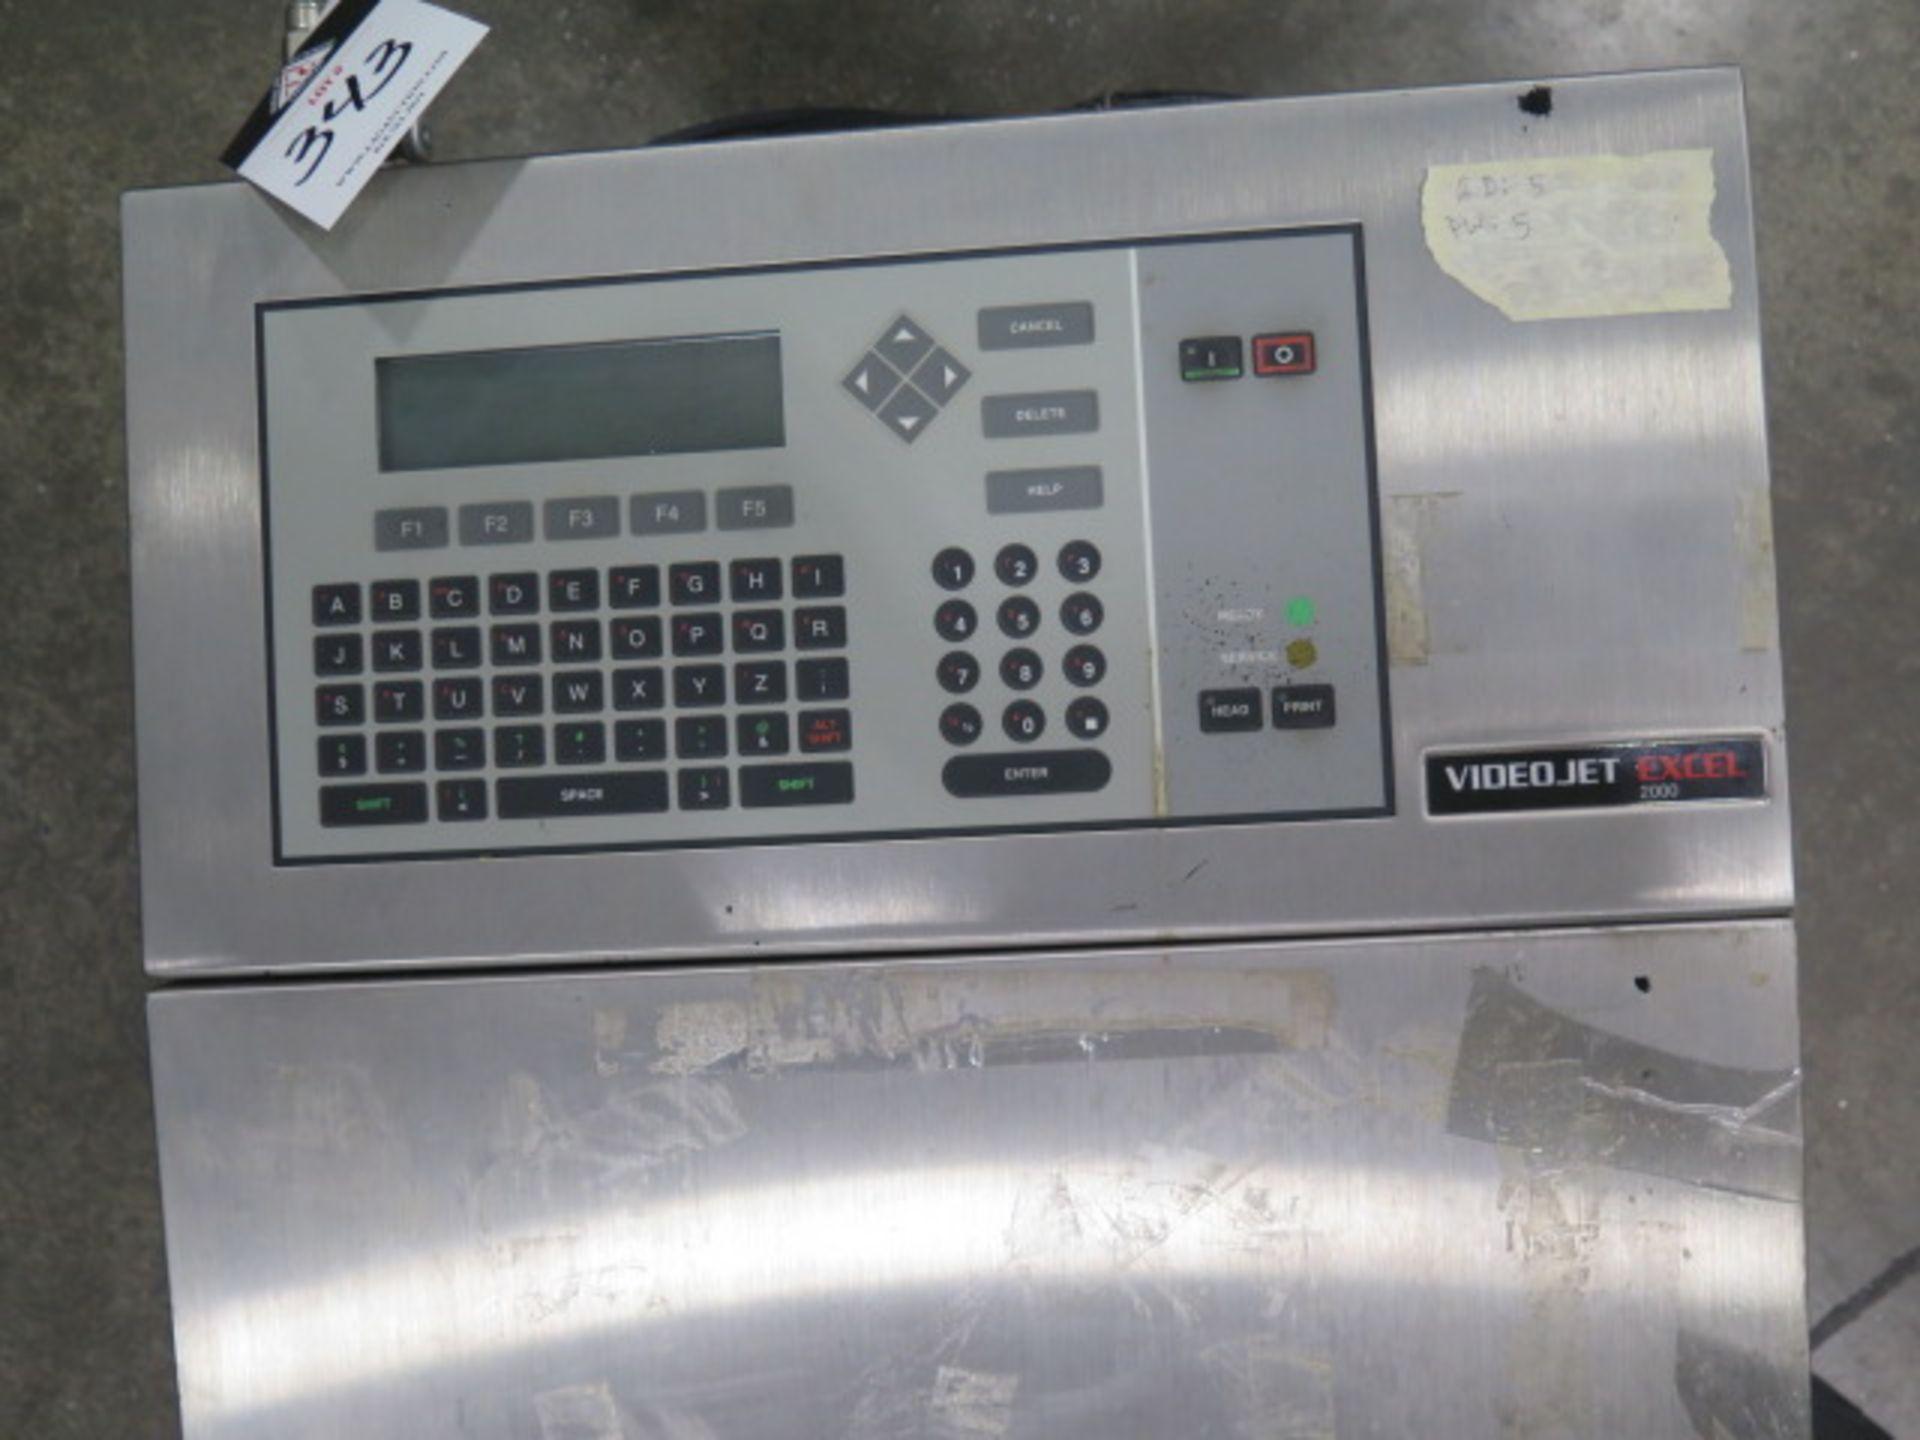 VideoJet EXCEL-2000 Ink Jet Printing System (SOLD AS-IS - NO WARRANTY) - Image 3 of 4